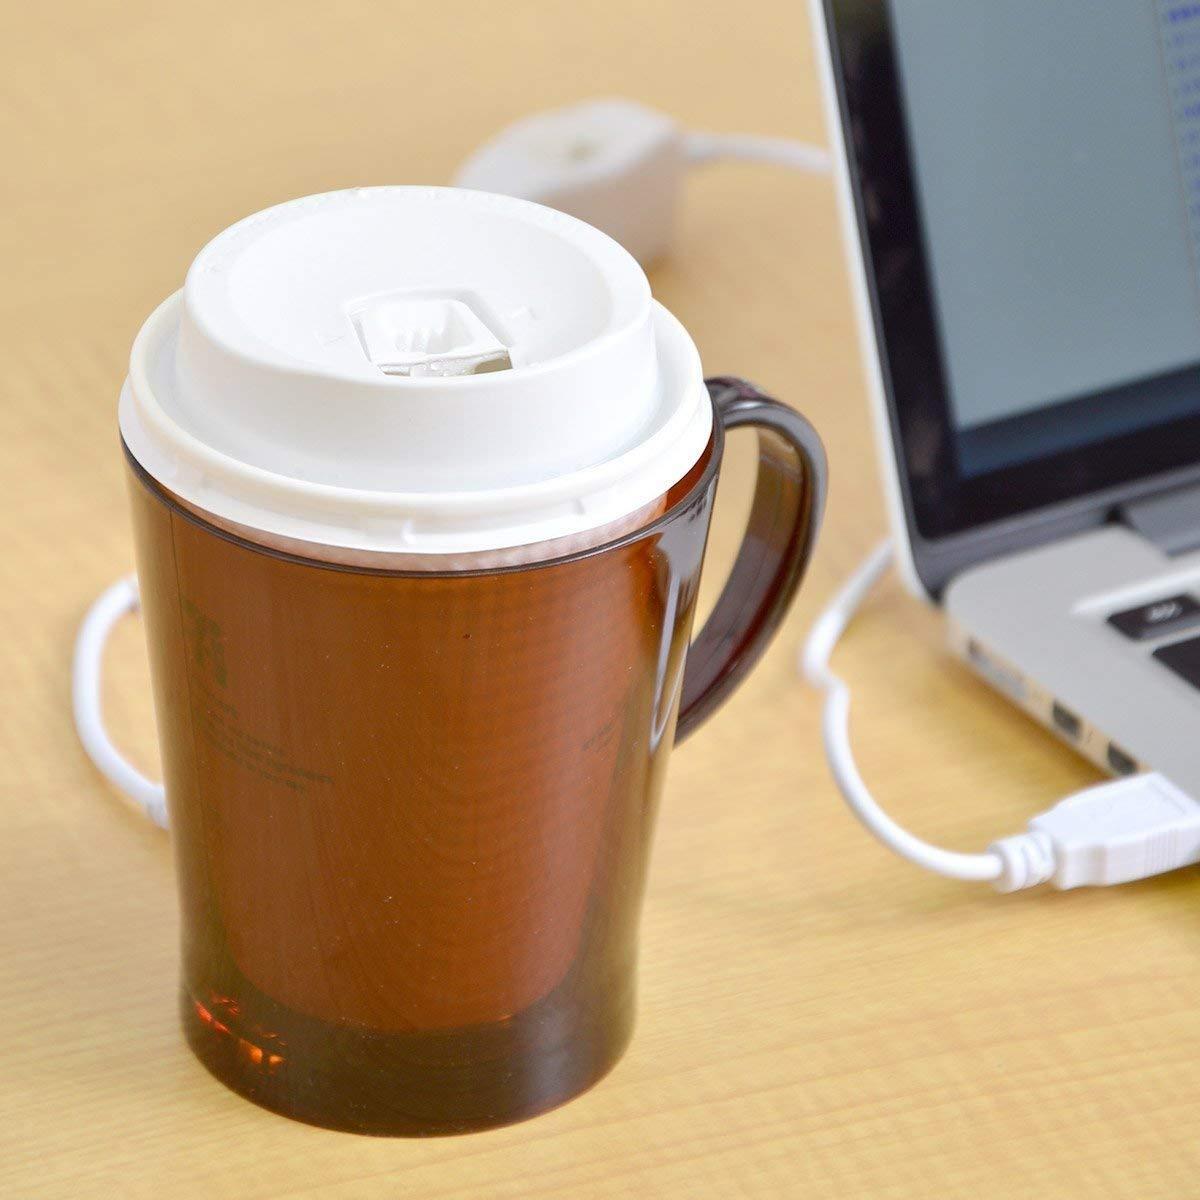 USB保冷器・保温器のおすすめ9選!コースター型や冷蔵庫型も